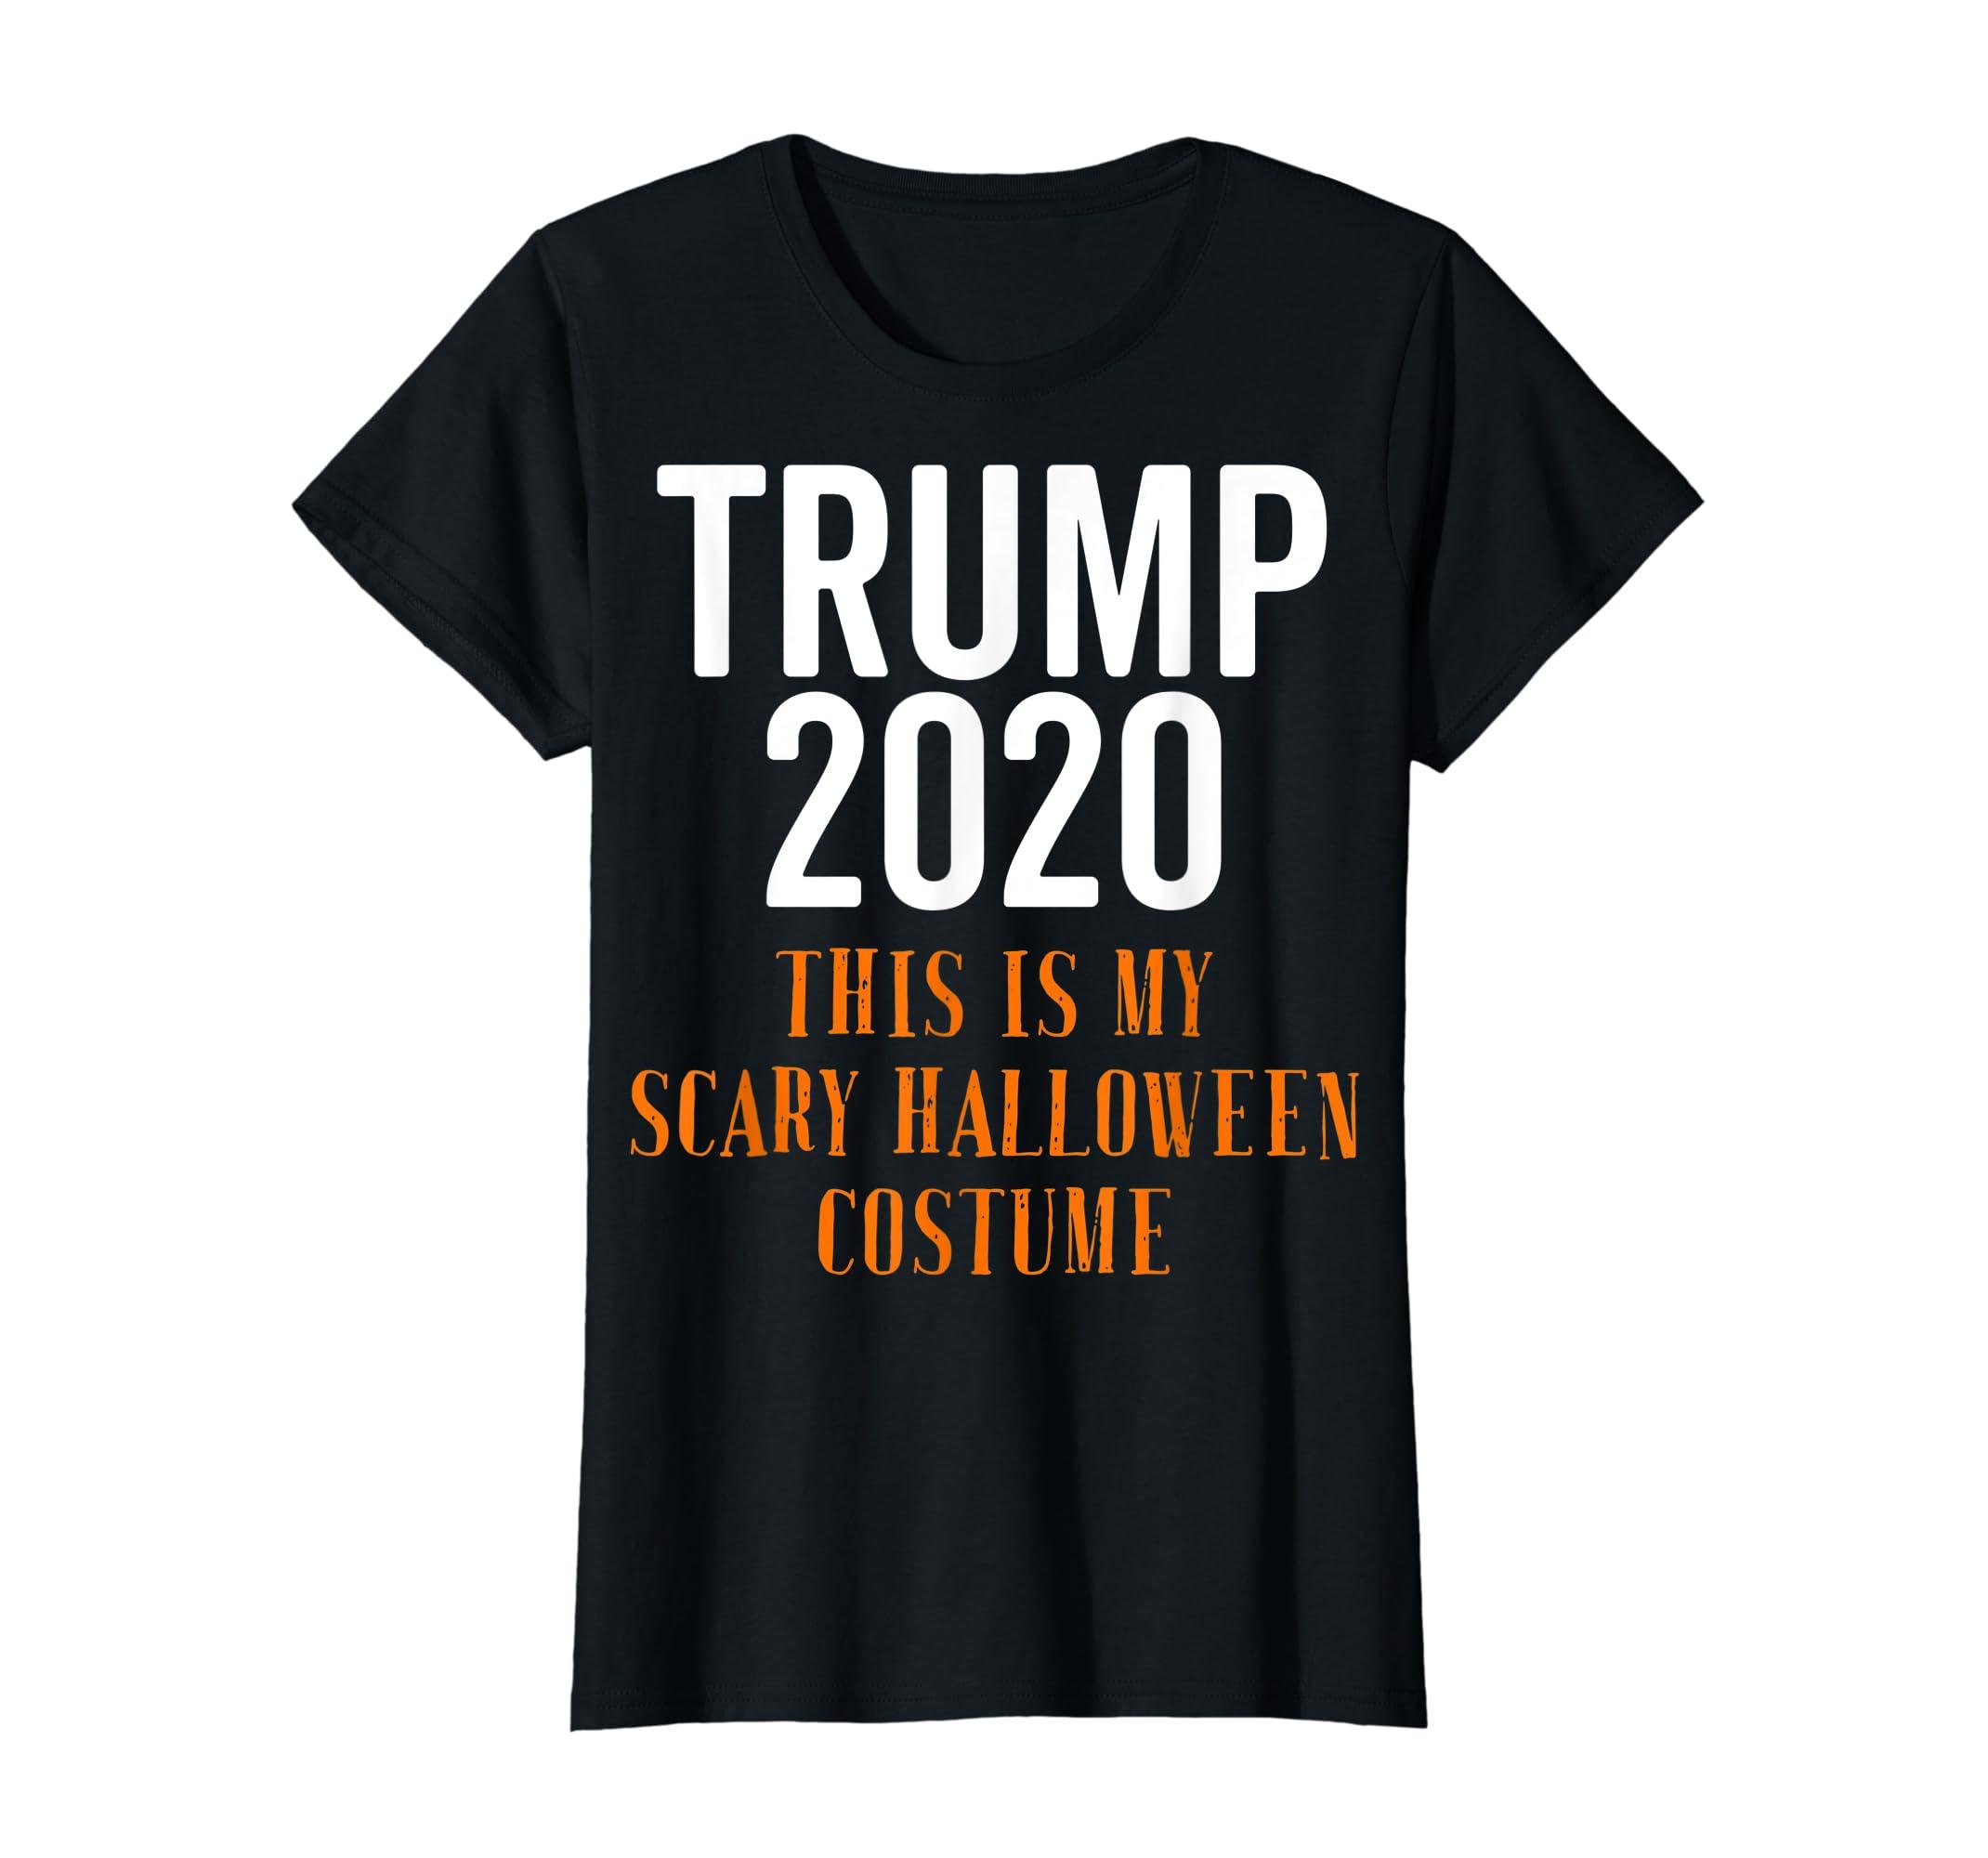 Scary Halloween No More Trump Funny Costume Anti Political T-Shirt-Women's T-Shirt-Black